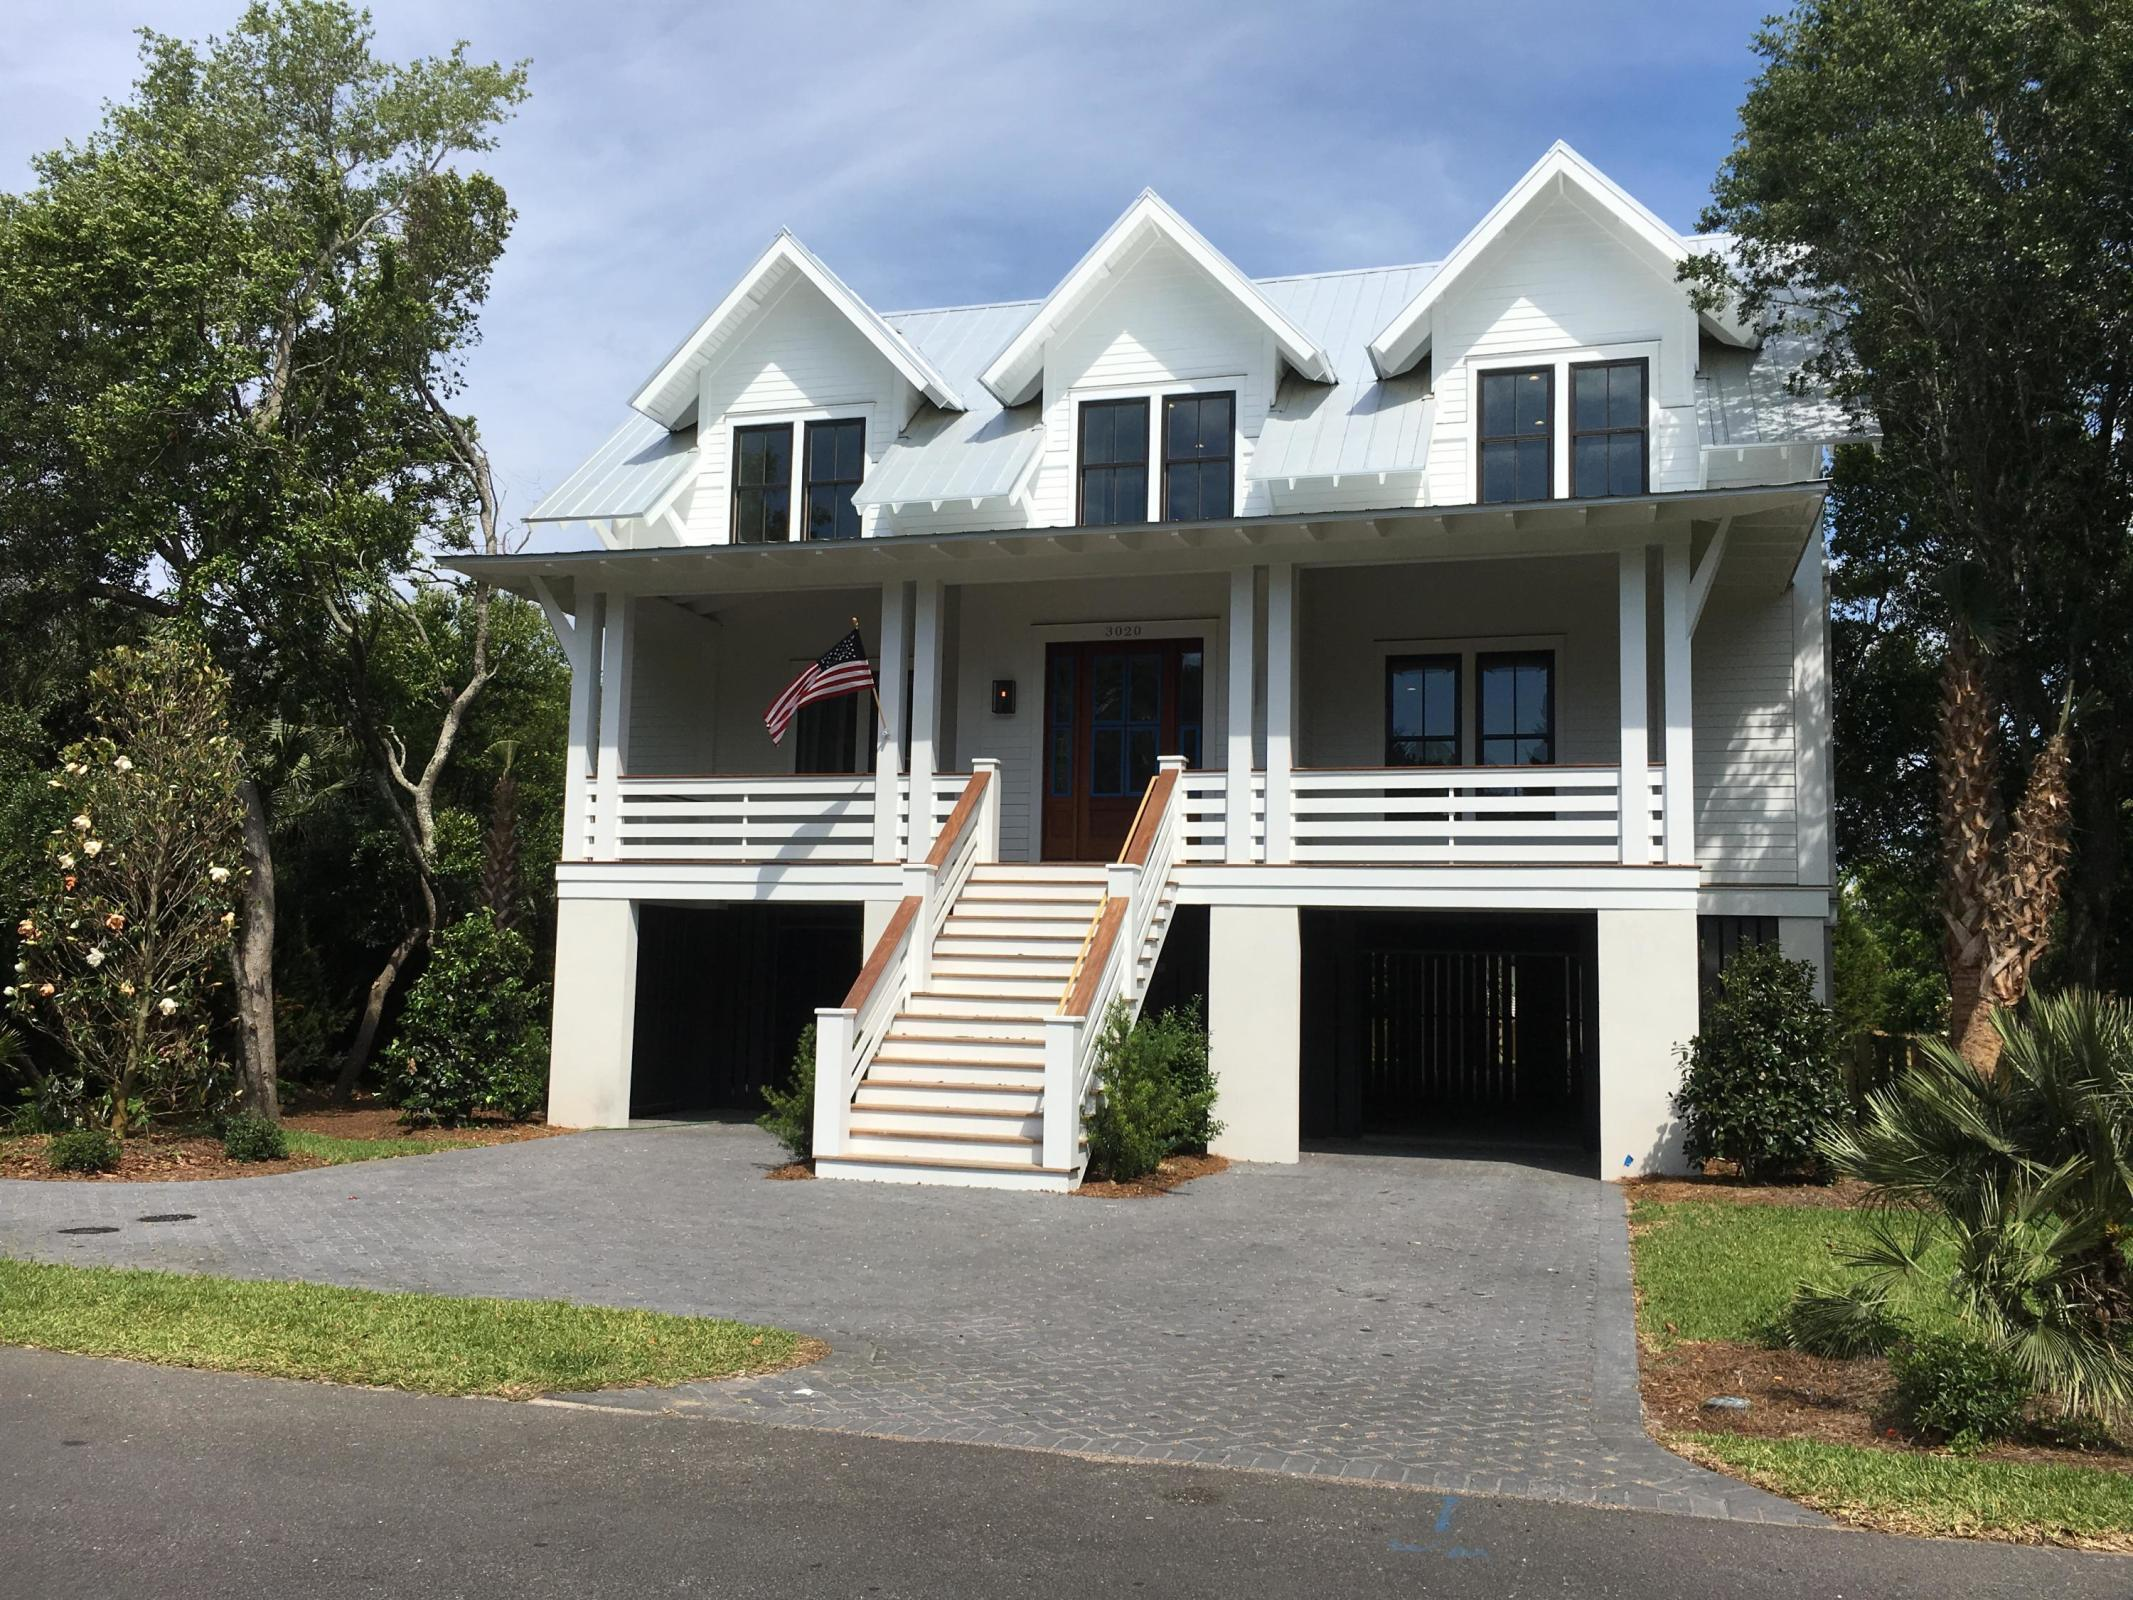 Sullivans Island Homes For Sale - 2864 Ion, Sullivans Island, SC - 5